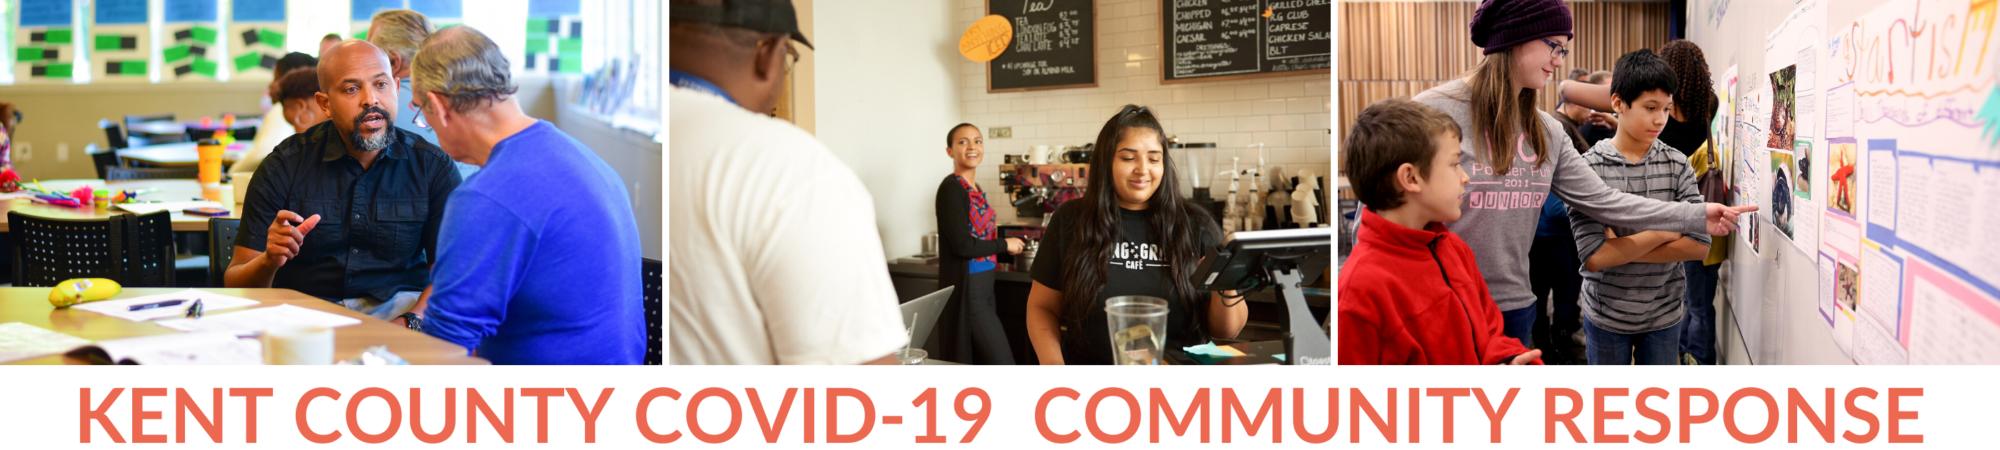 Covid 19 Community Response Fund 9